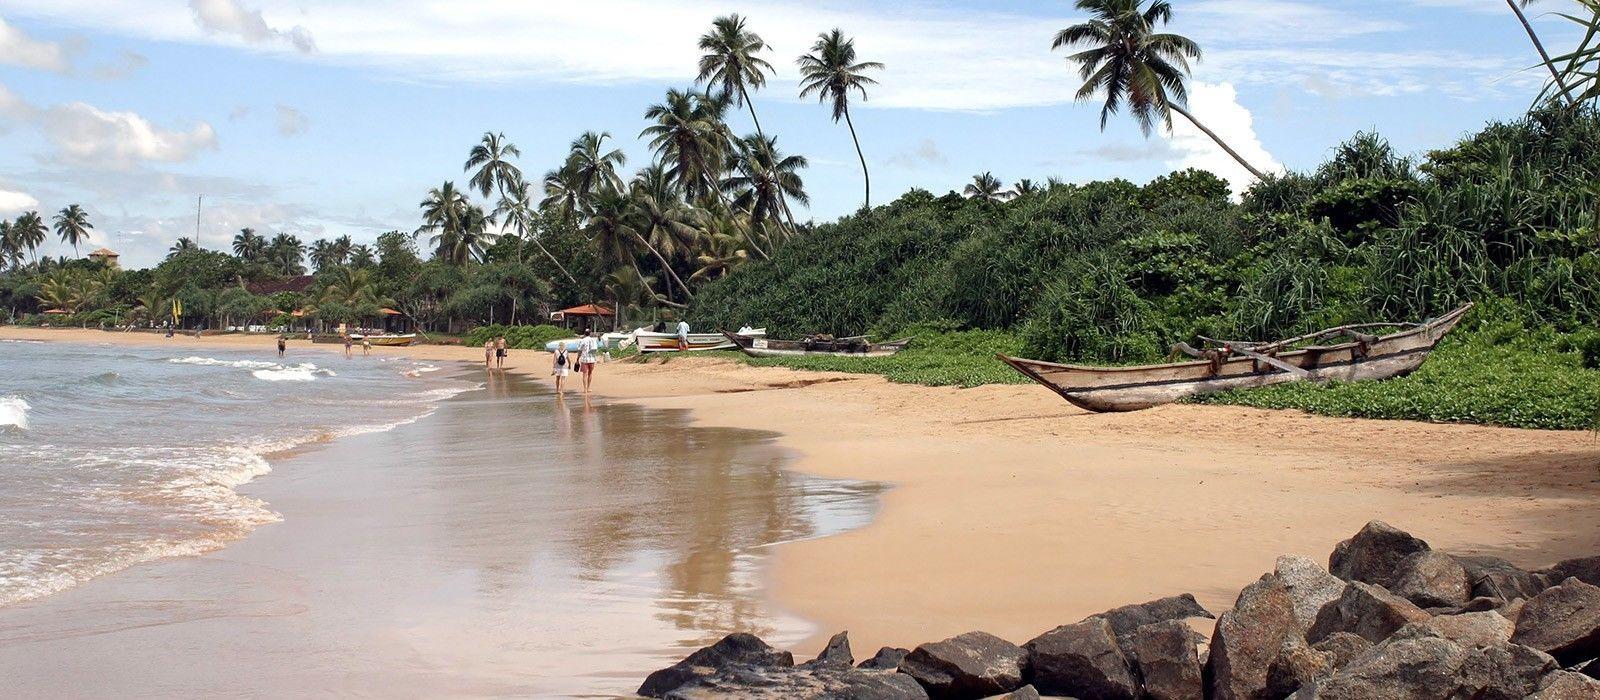 Luxuriös und hautnah – Große Sri Lanka Rundreise Urlaub 1